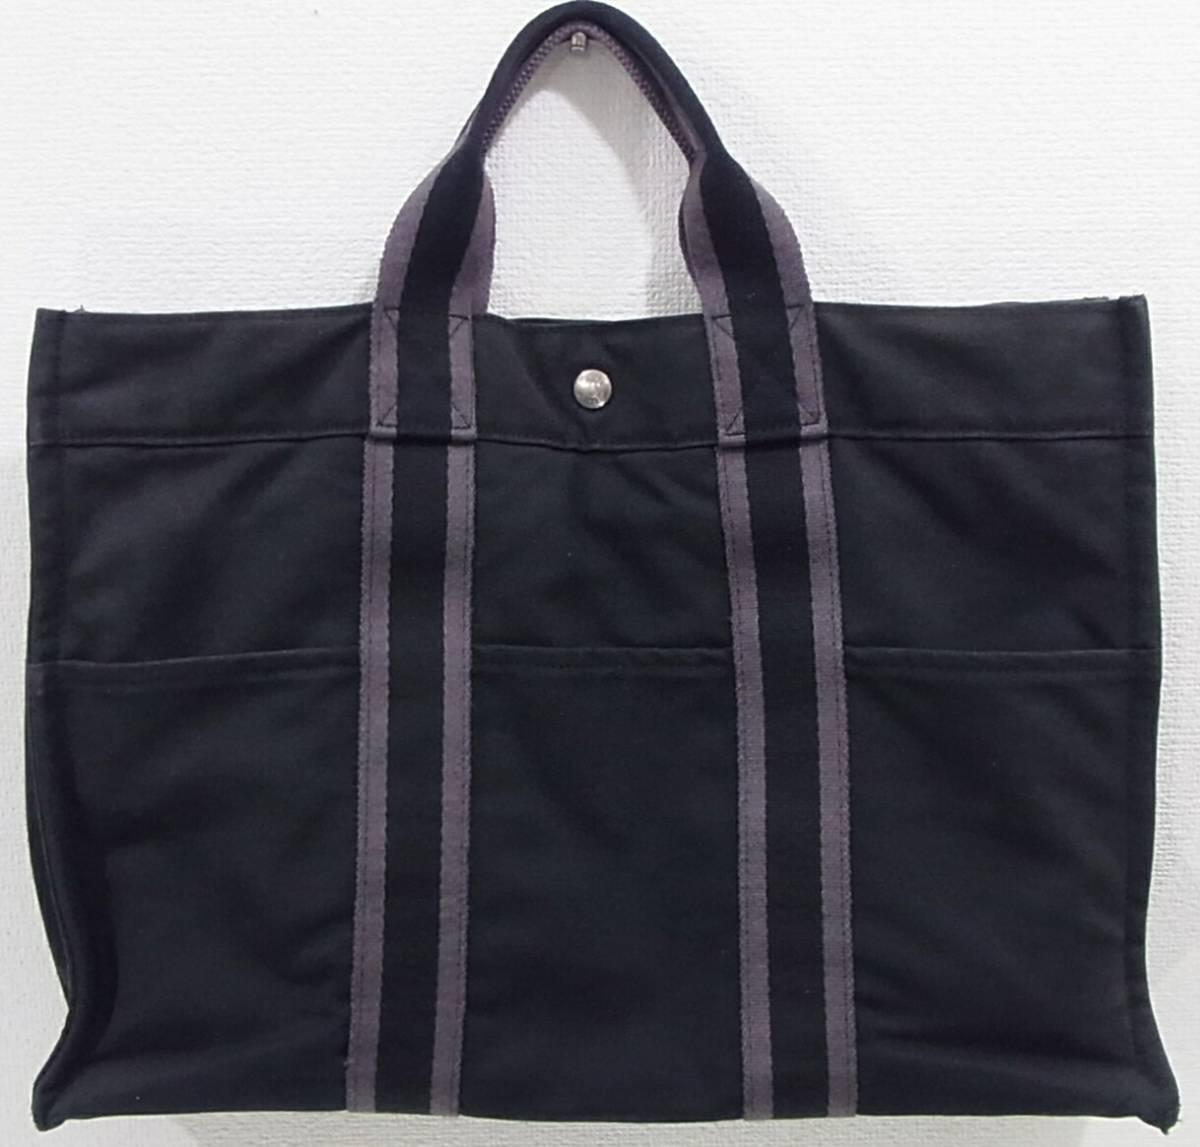 HERMES フールトゥMM 黒 キャンバストートバッグ ブラック×ダークグレー 2本ライン トートMM コットン手提げかばん ハンドバッグ エルメス_画像2